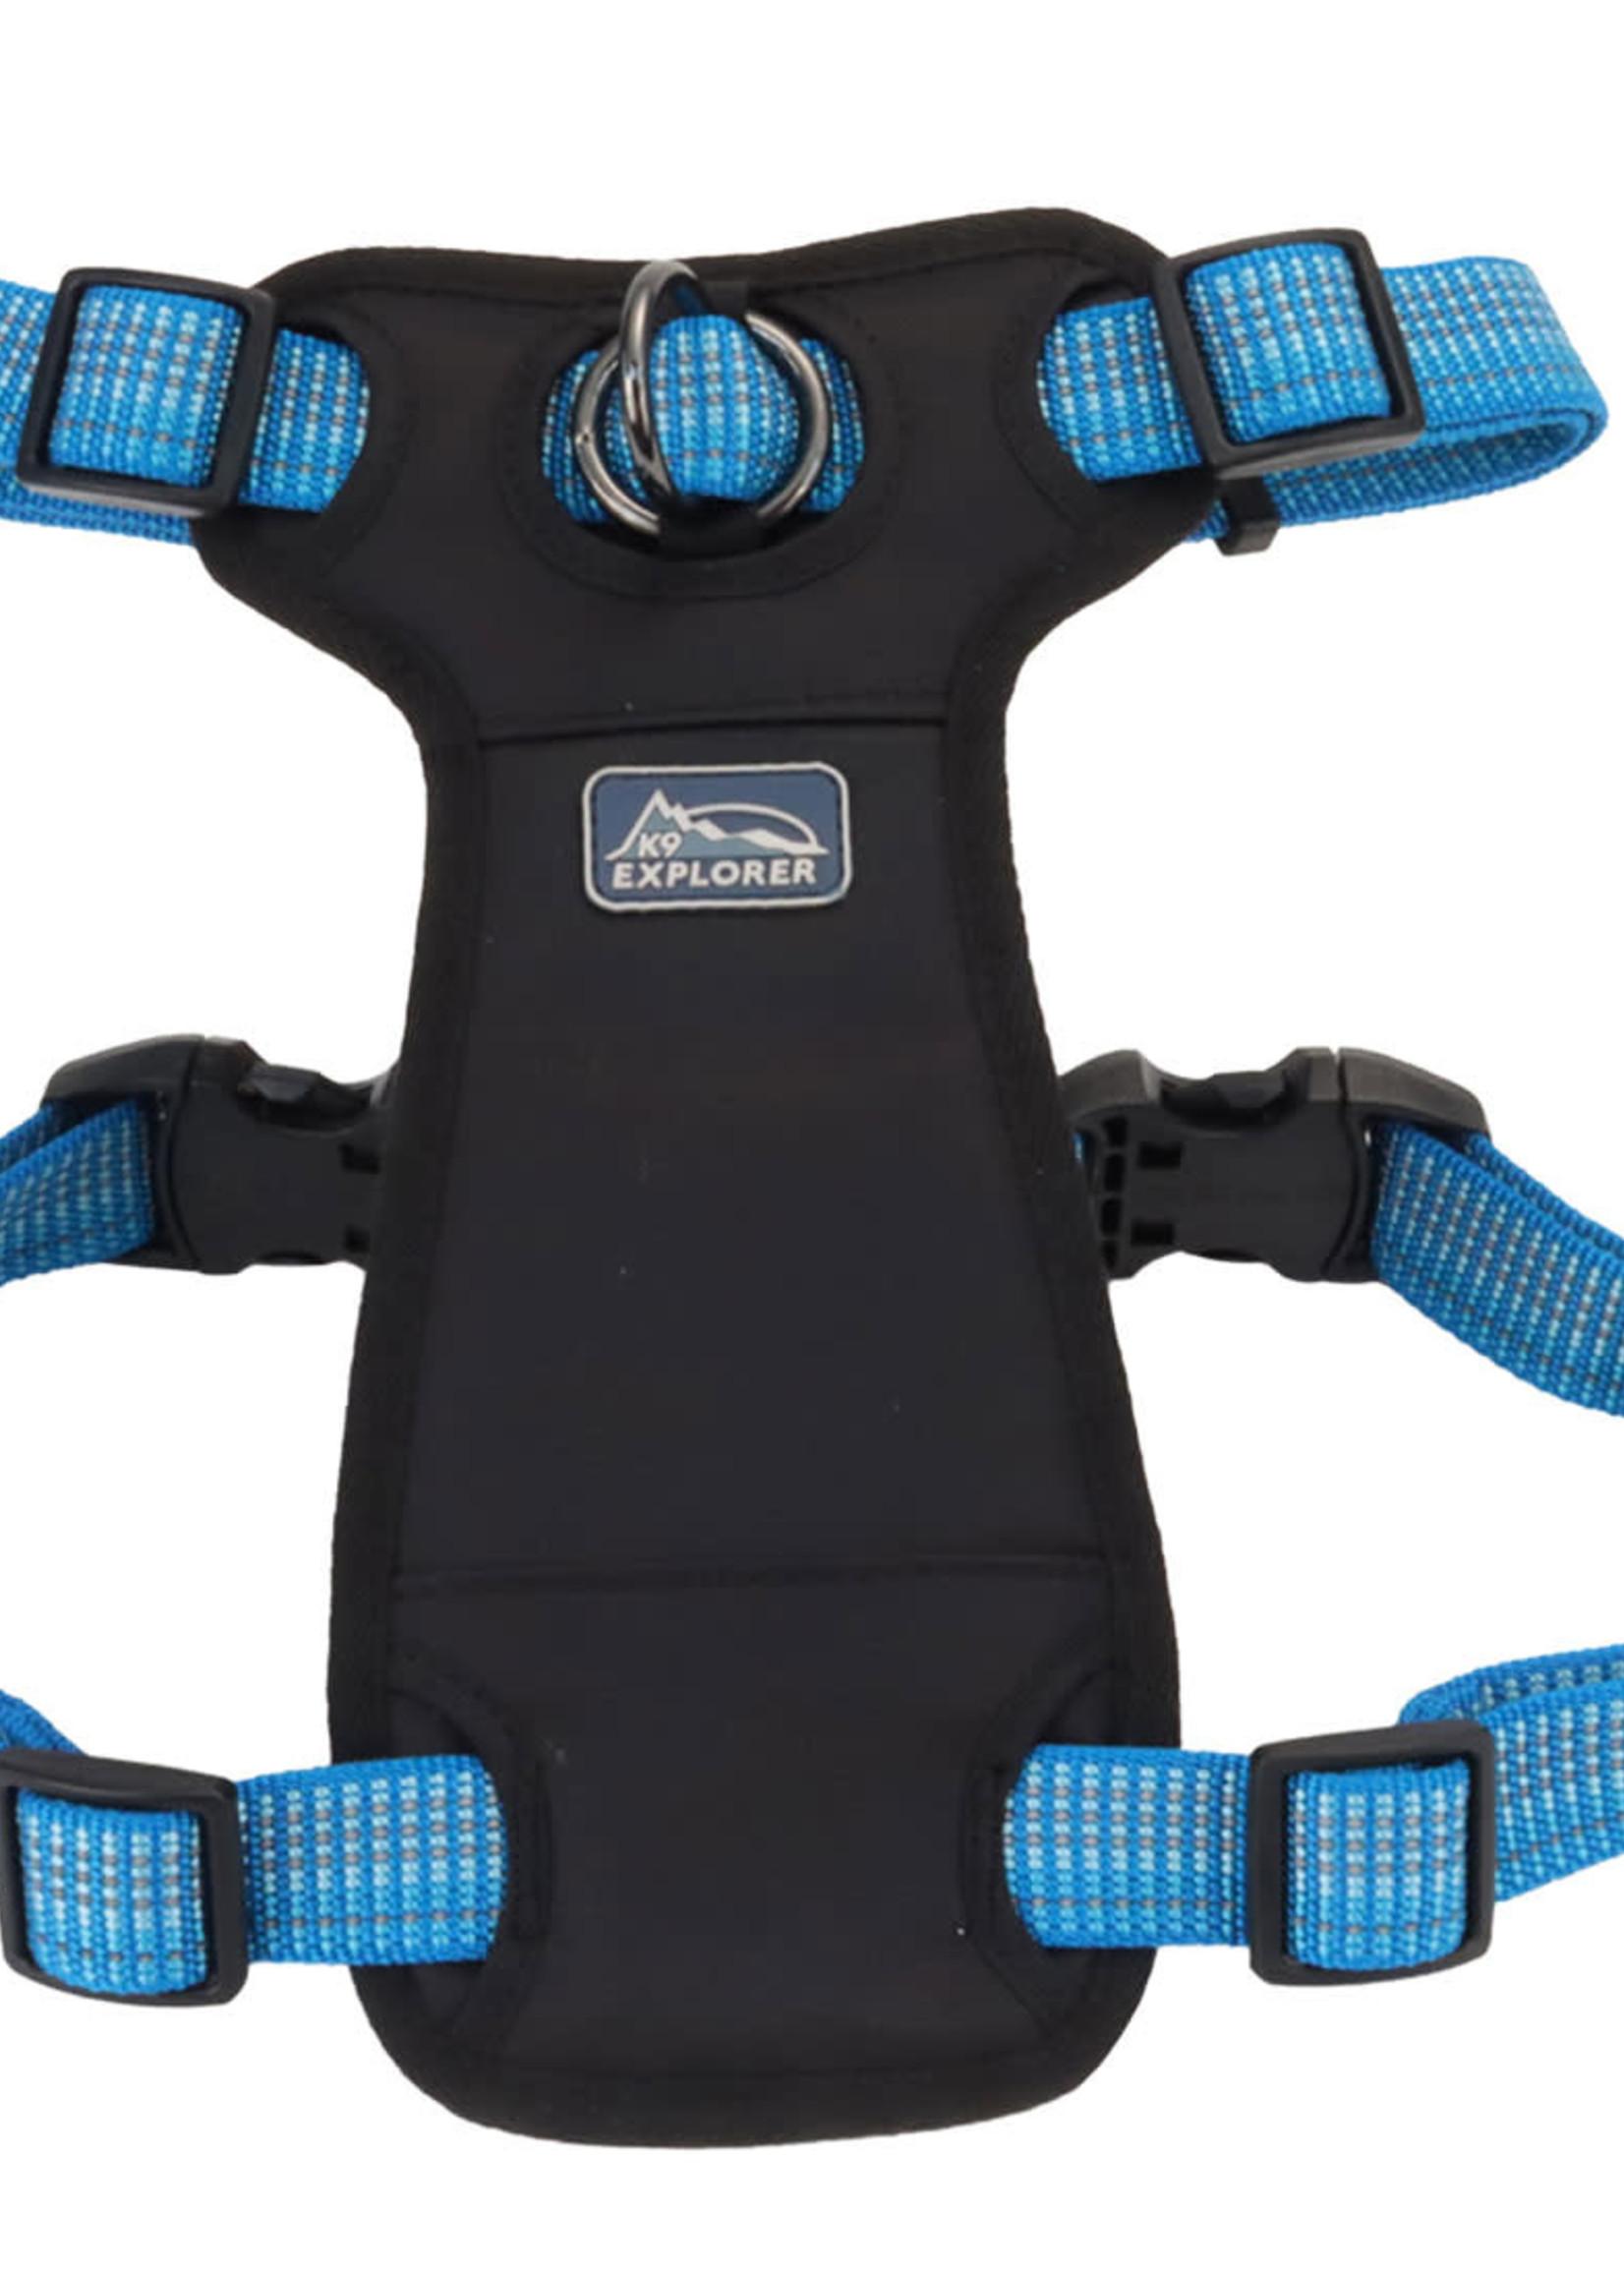 K9 Explorer® Coastal K9 Explorer Brights Reflective Front-Connect Harness Medium